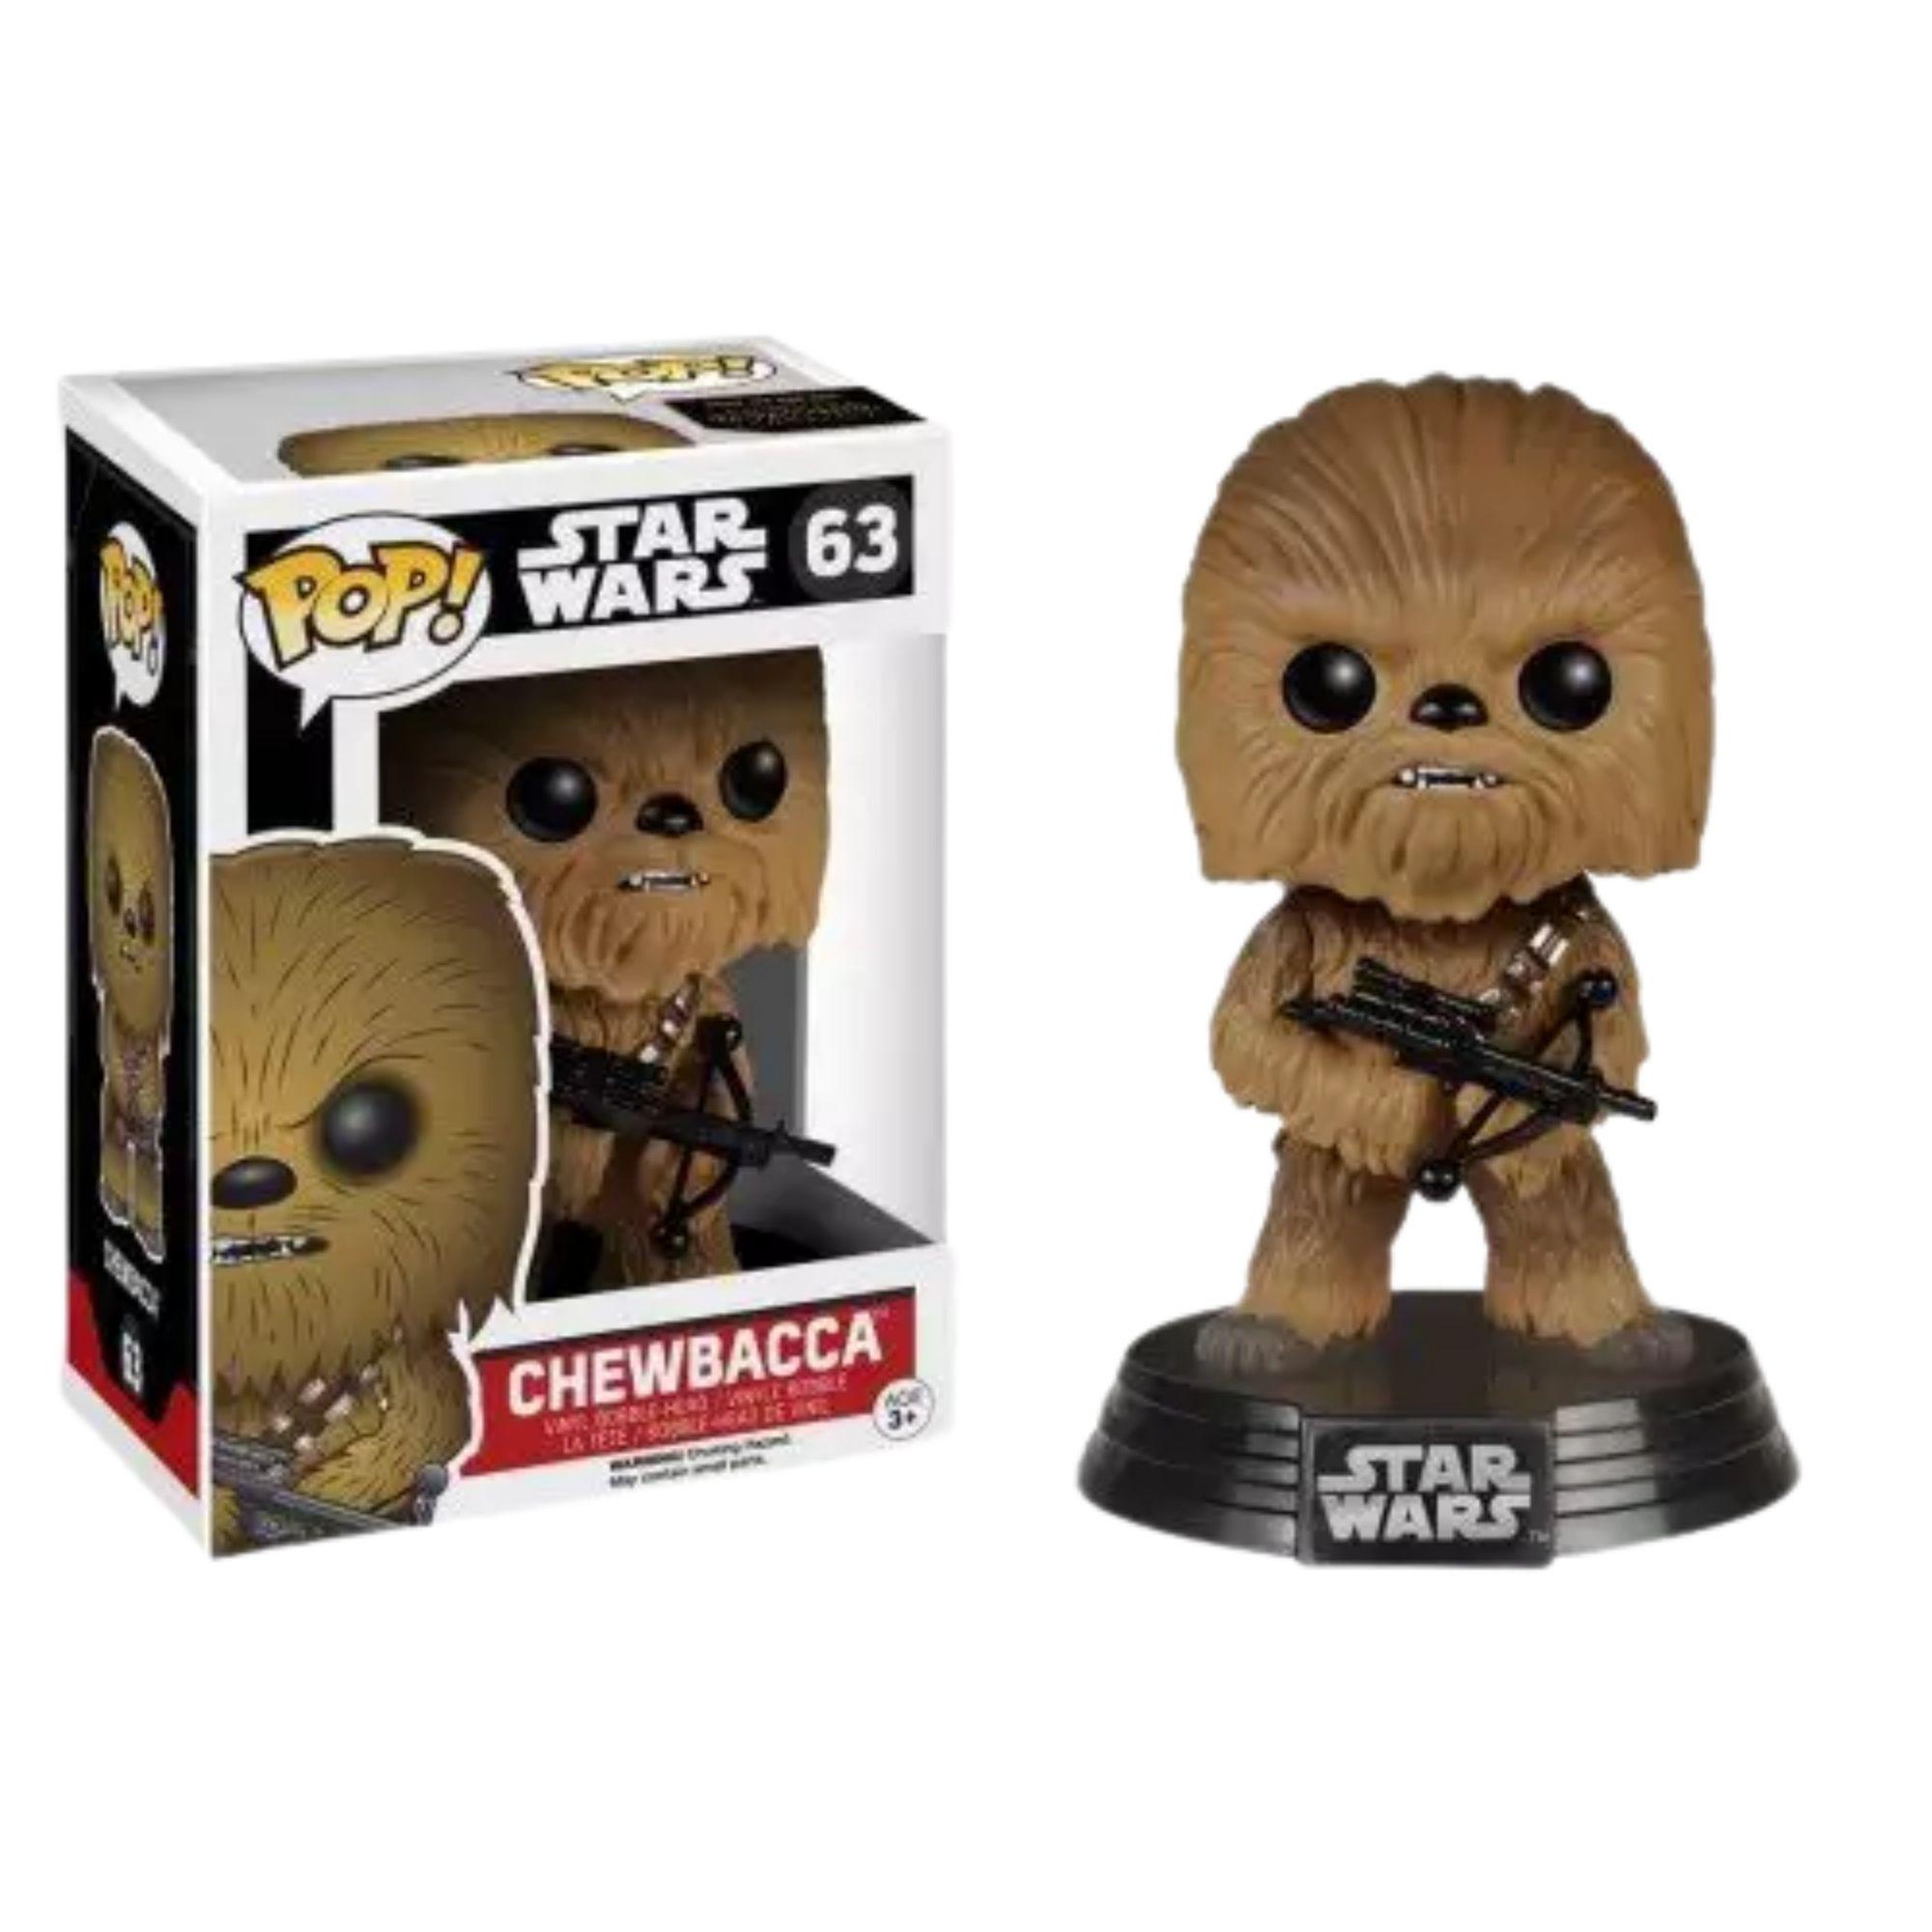 Chewbacca Boneco Funko Pop Star Wars #63  - Game Land Brinquedos